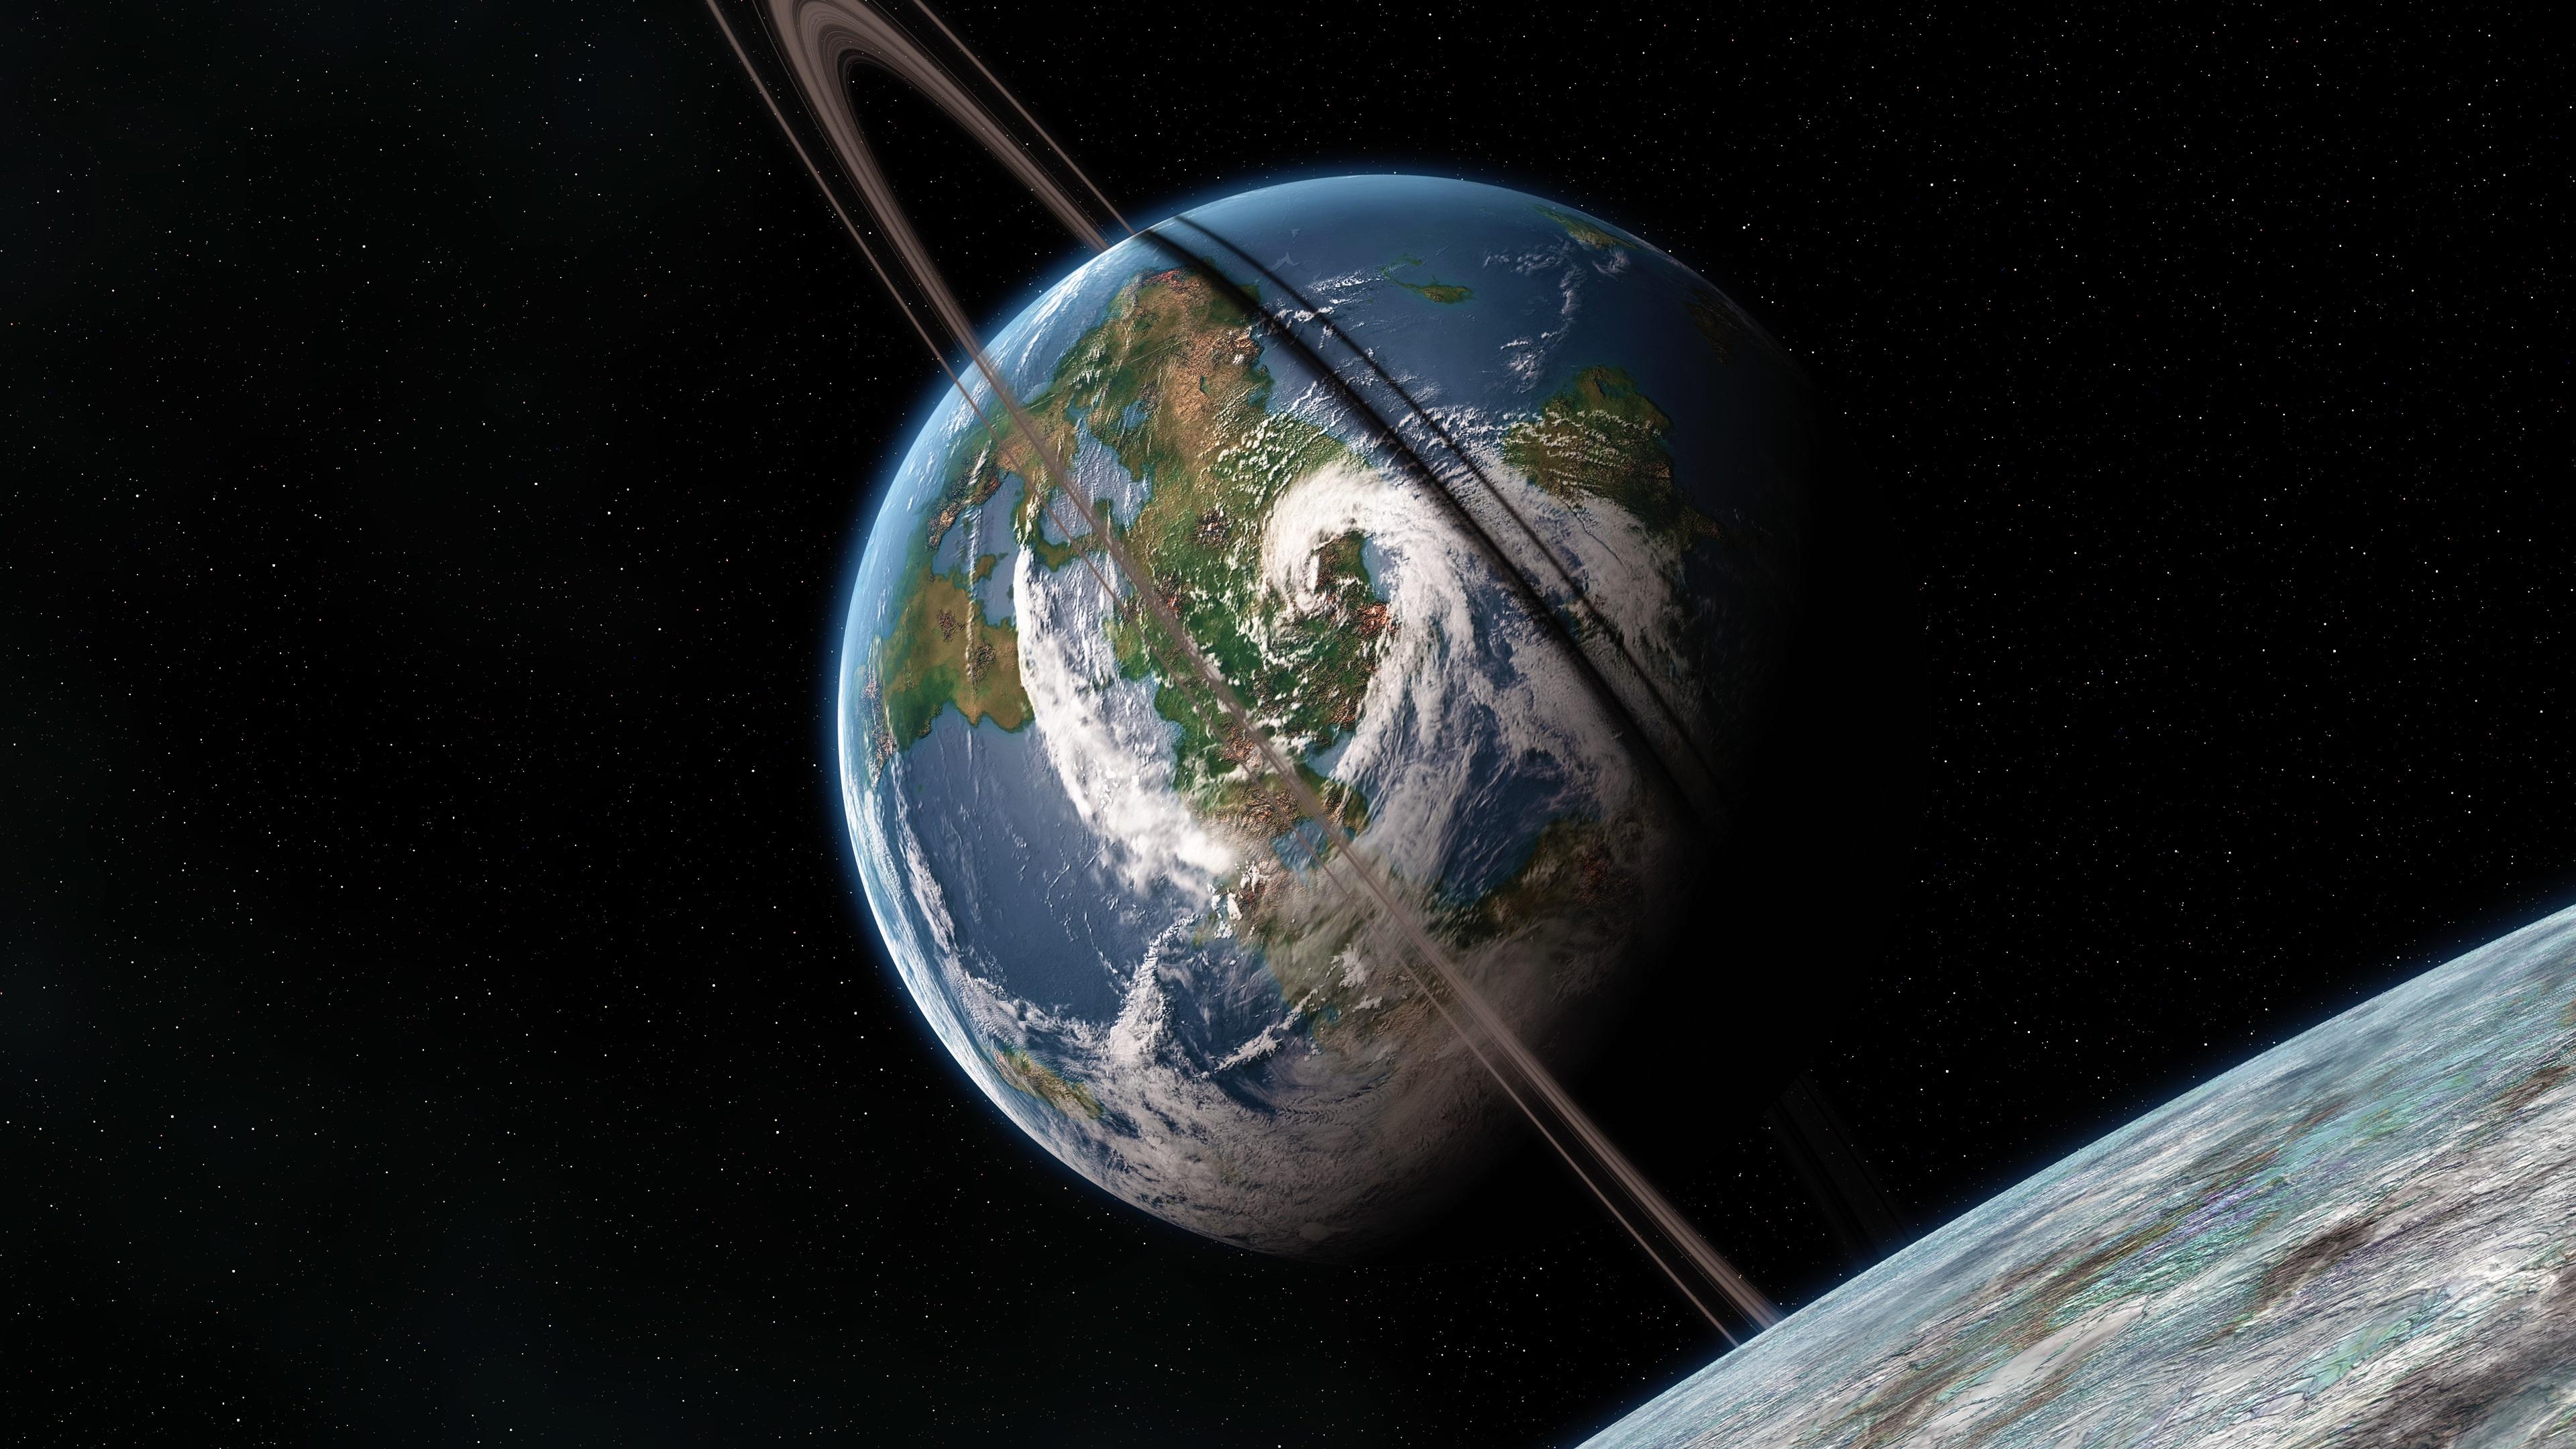 Planetas, Tierra, Espacio, Fondo Negro Fondos De Pantalla